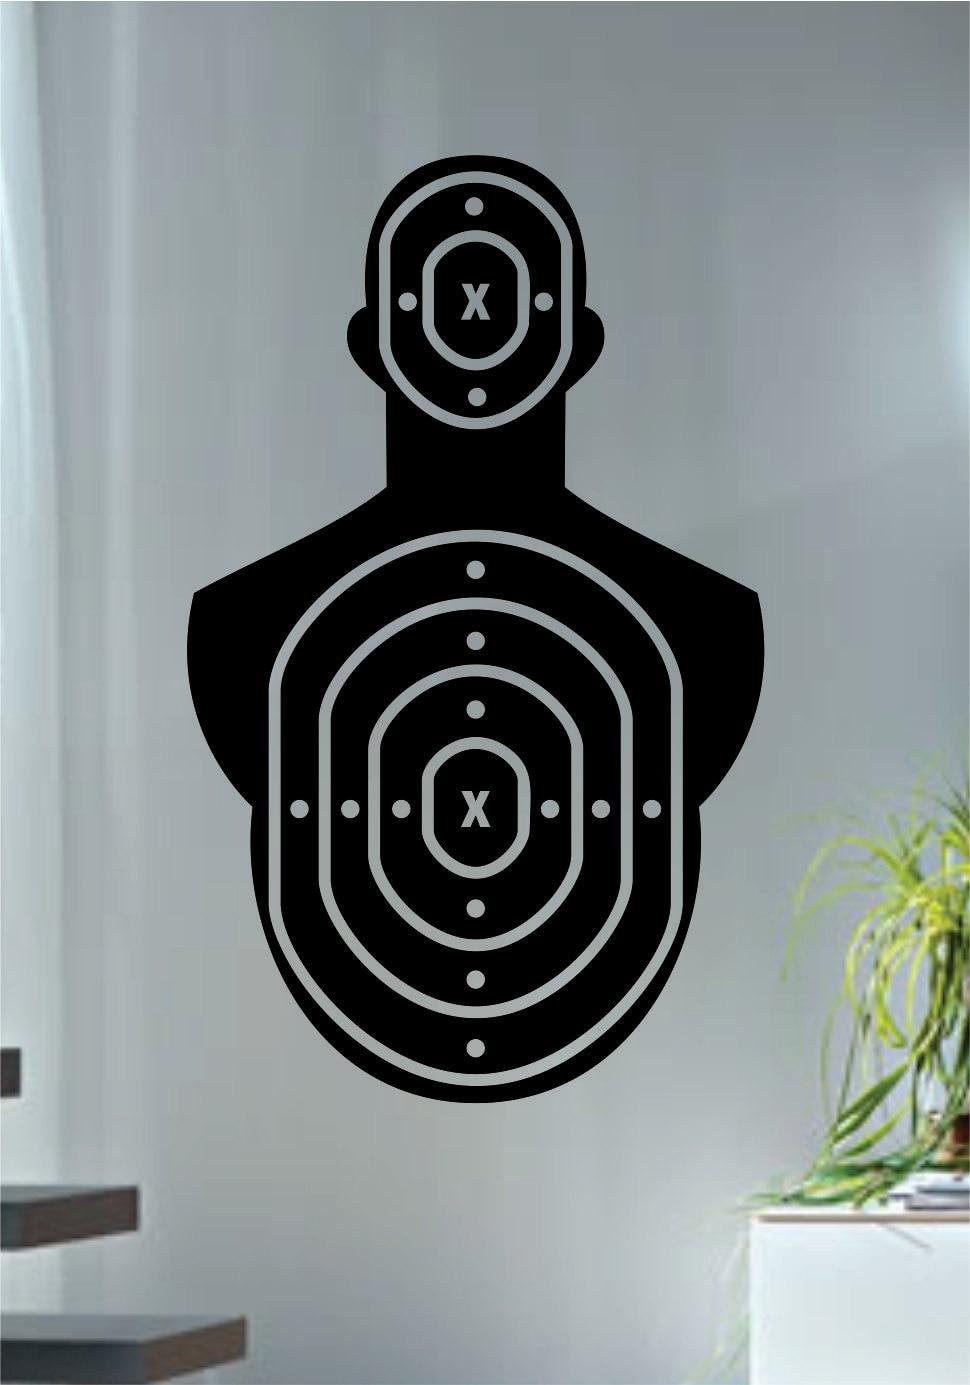 Shooting Range Wall Decal Special Design Target Version